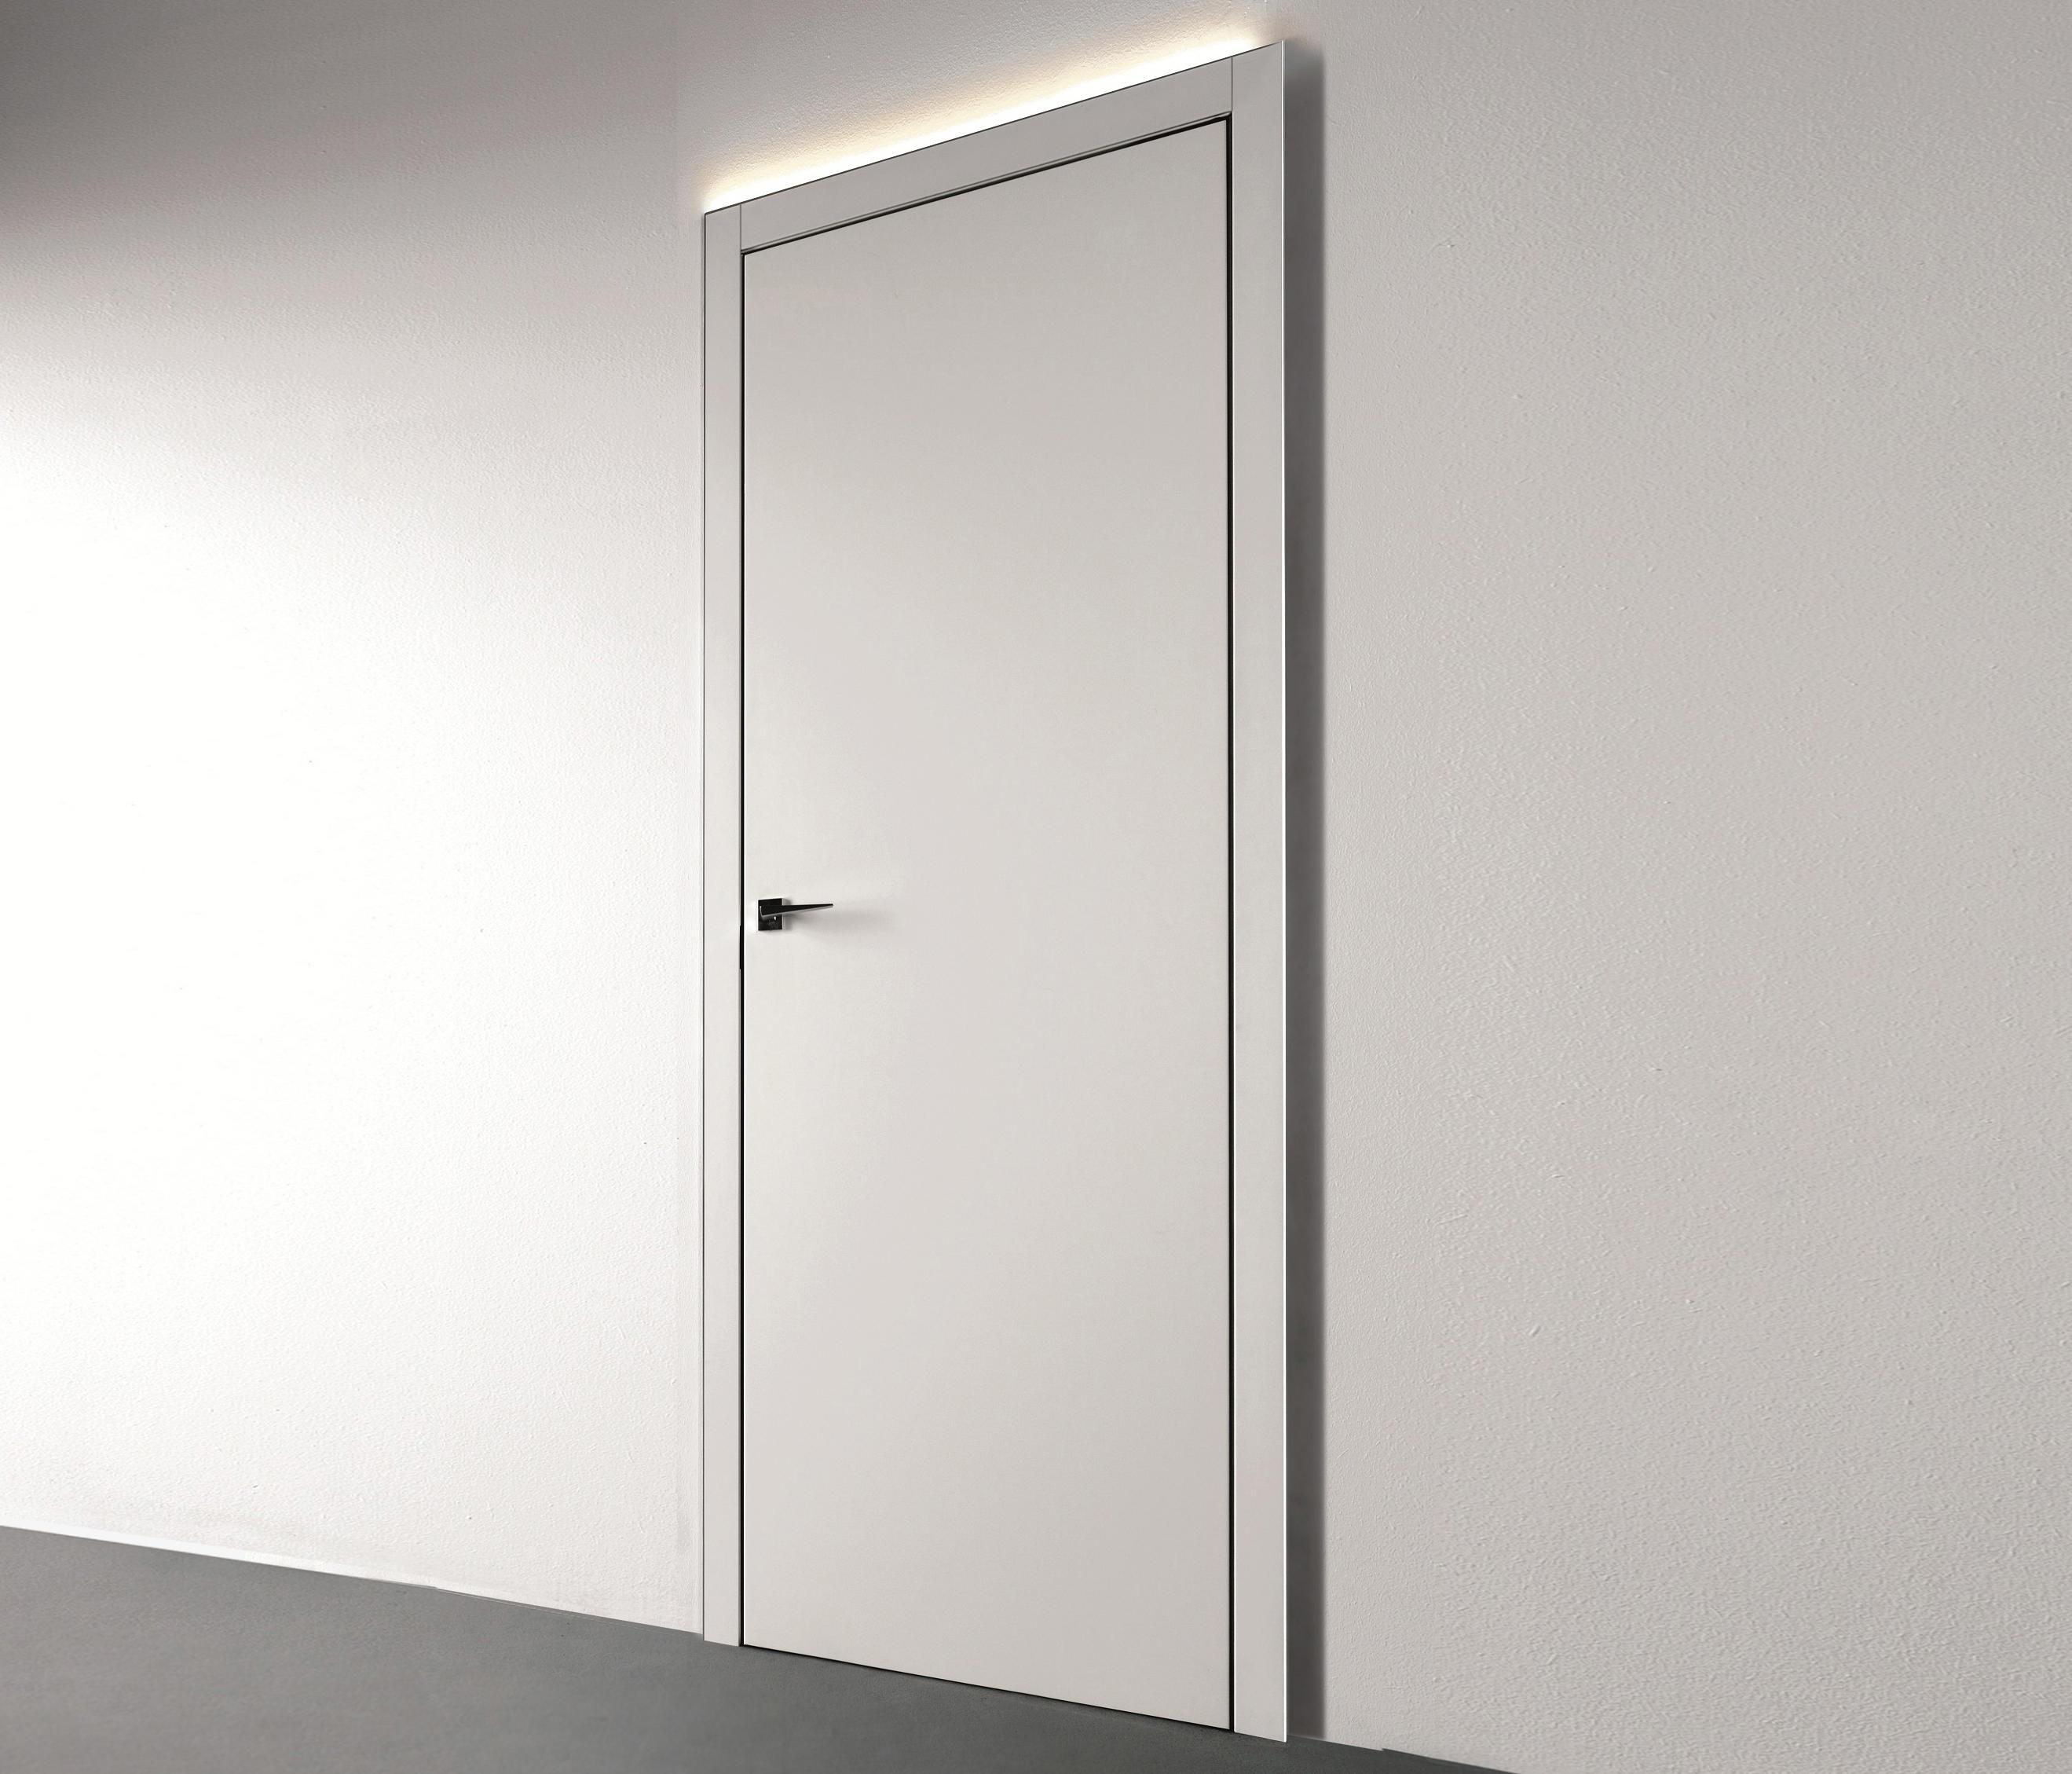 IDEA - Internal doors from TRE-P & TRE-Più | Architonic